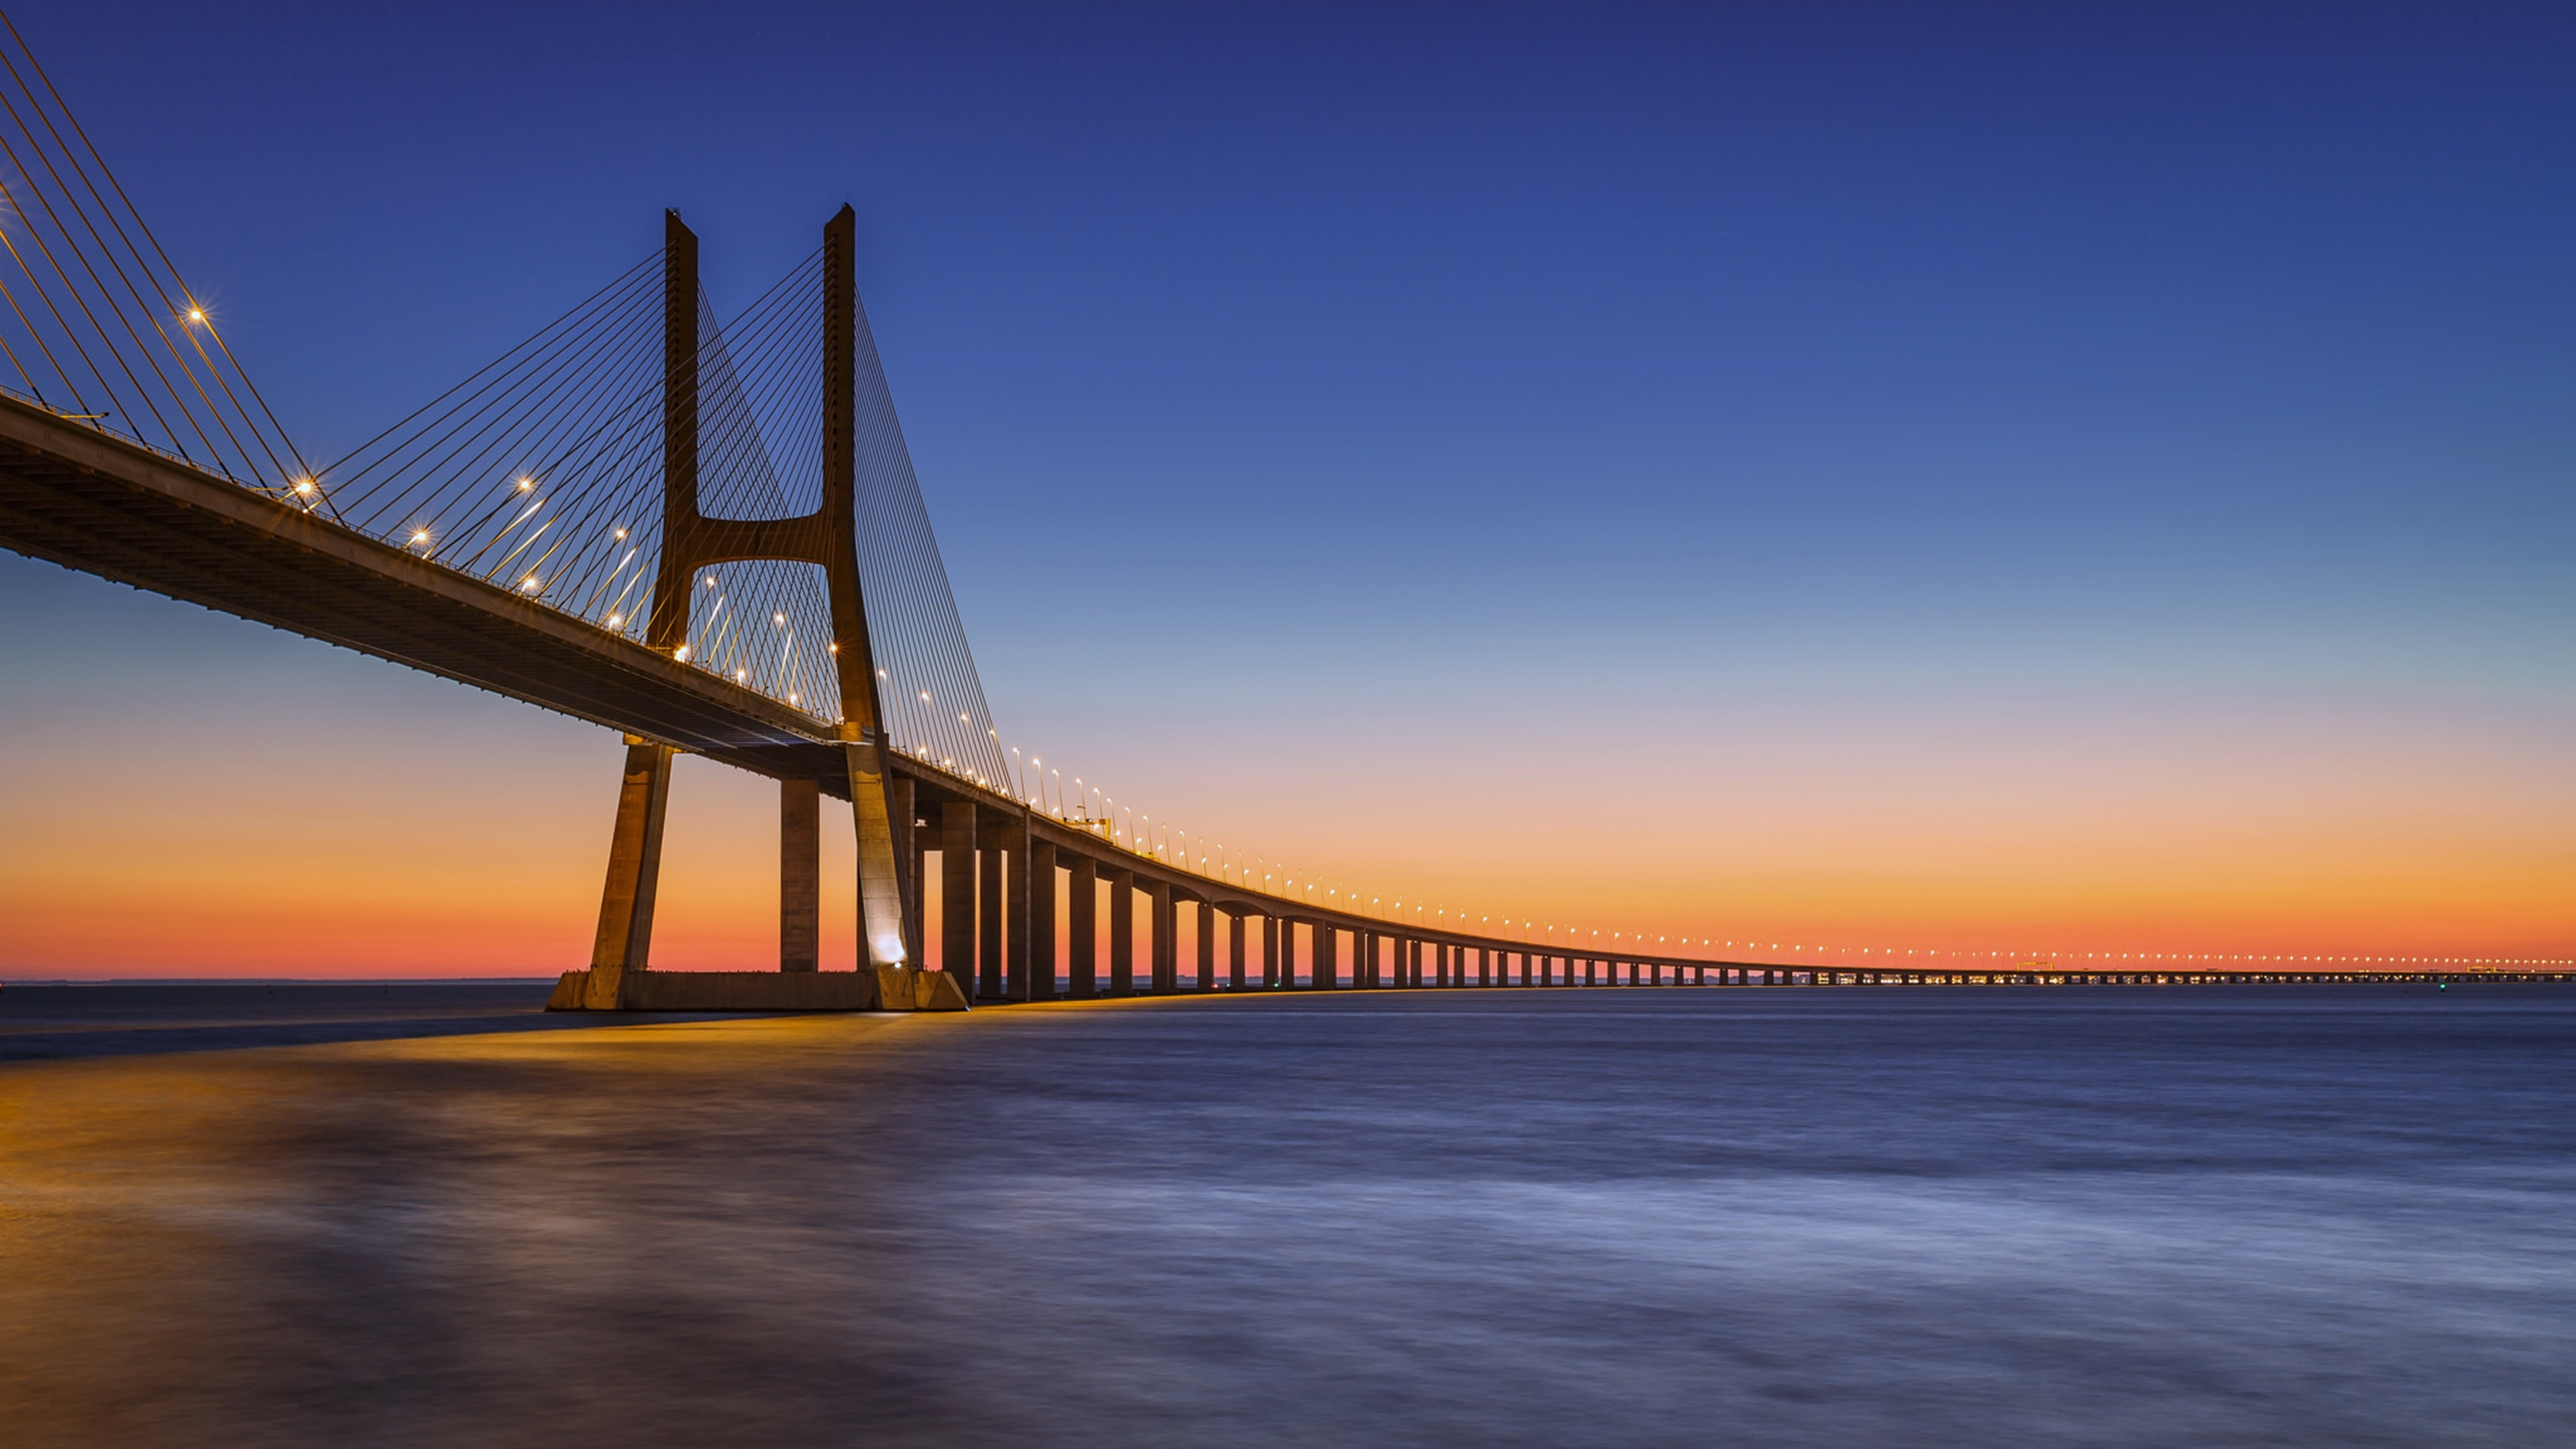 vasco-da-gama-bridge-wallpapers-hd-70785-6584245